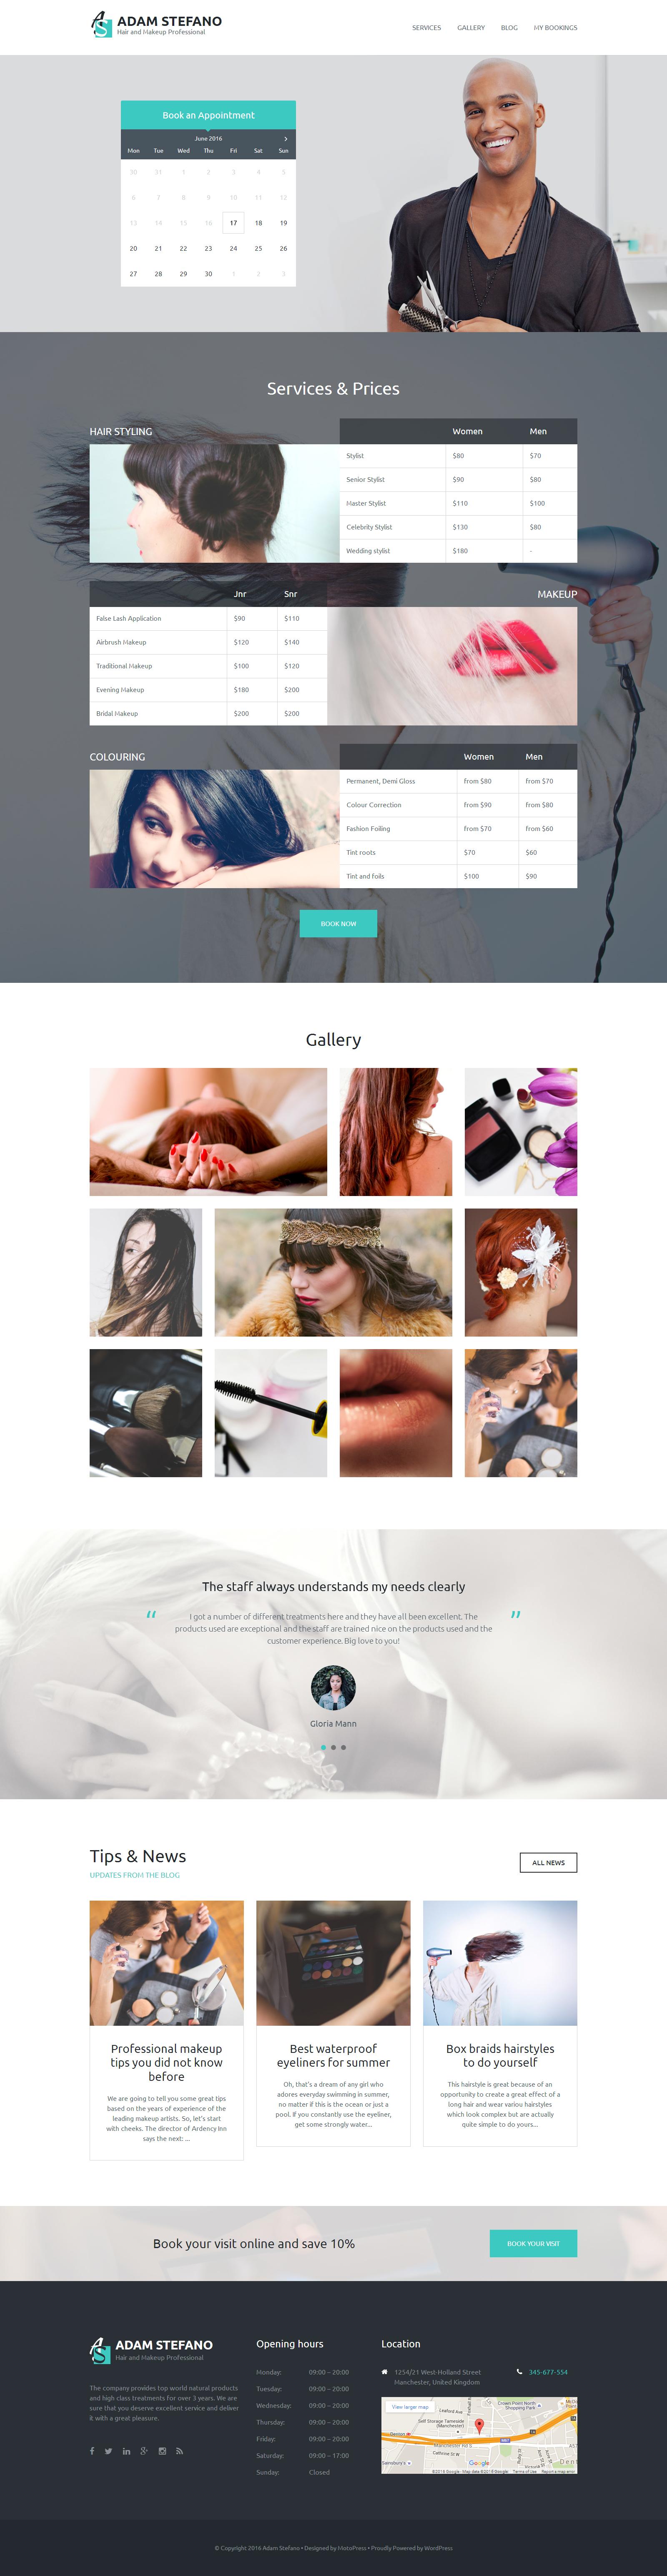 """Adam Stefano - Hair & Makeup Professional"" thème WordPress adaptatif #58877"